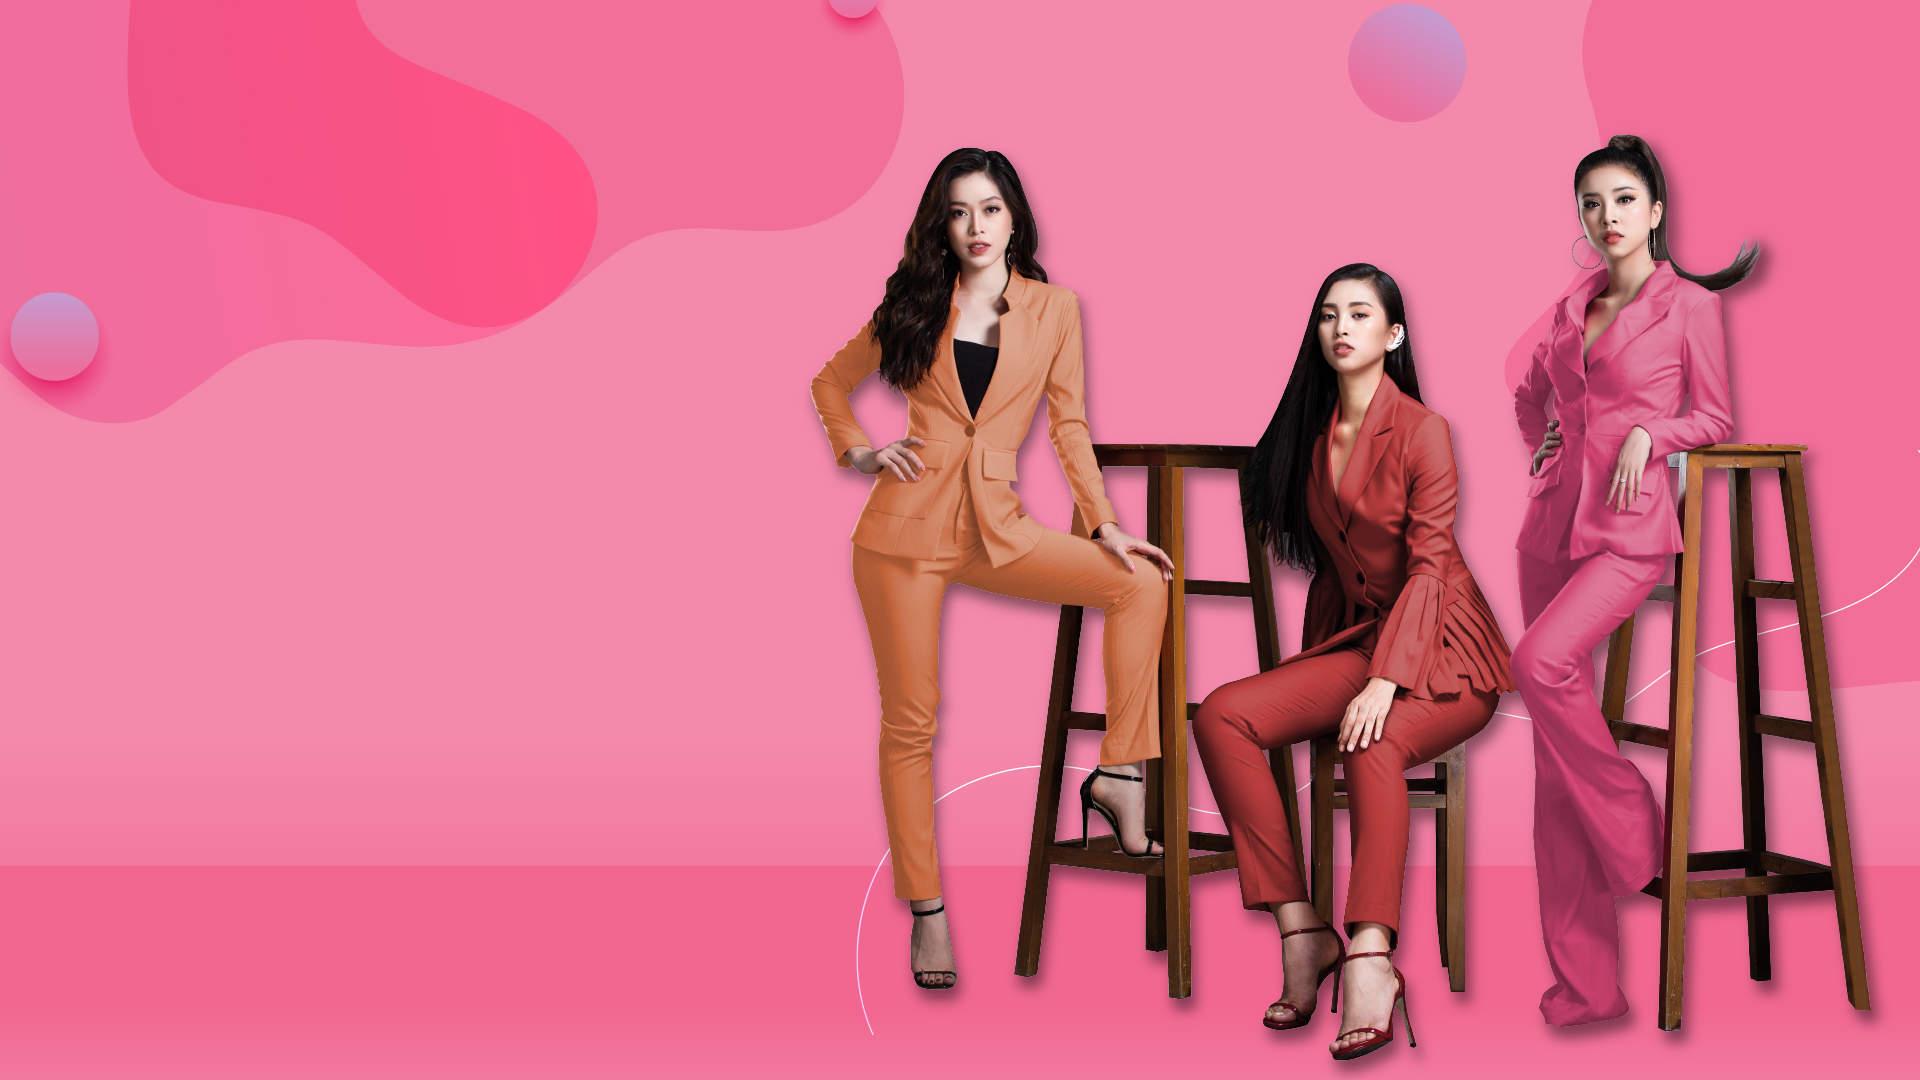 Talkshow Series - Hoa Hậu Việt Nam 2020